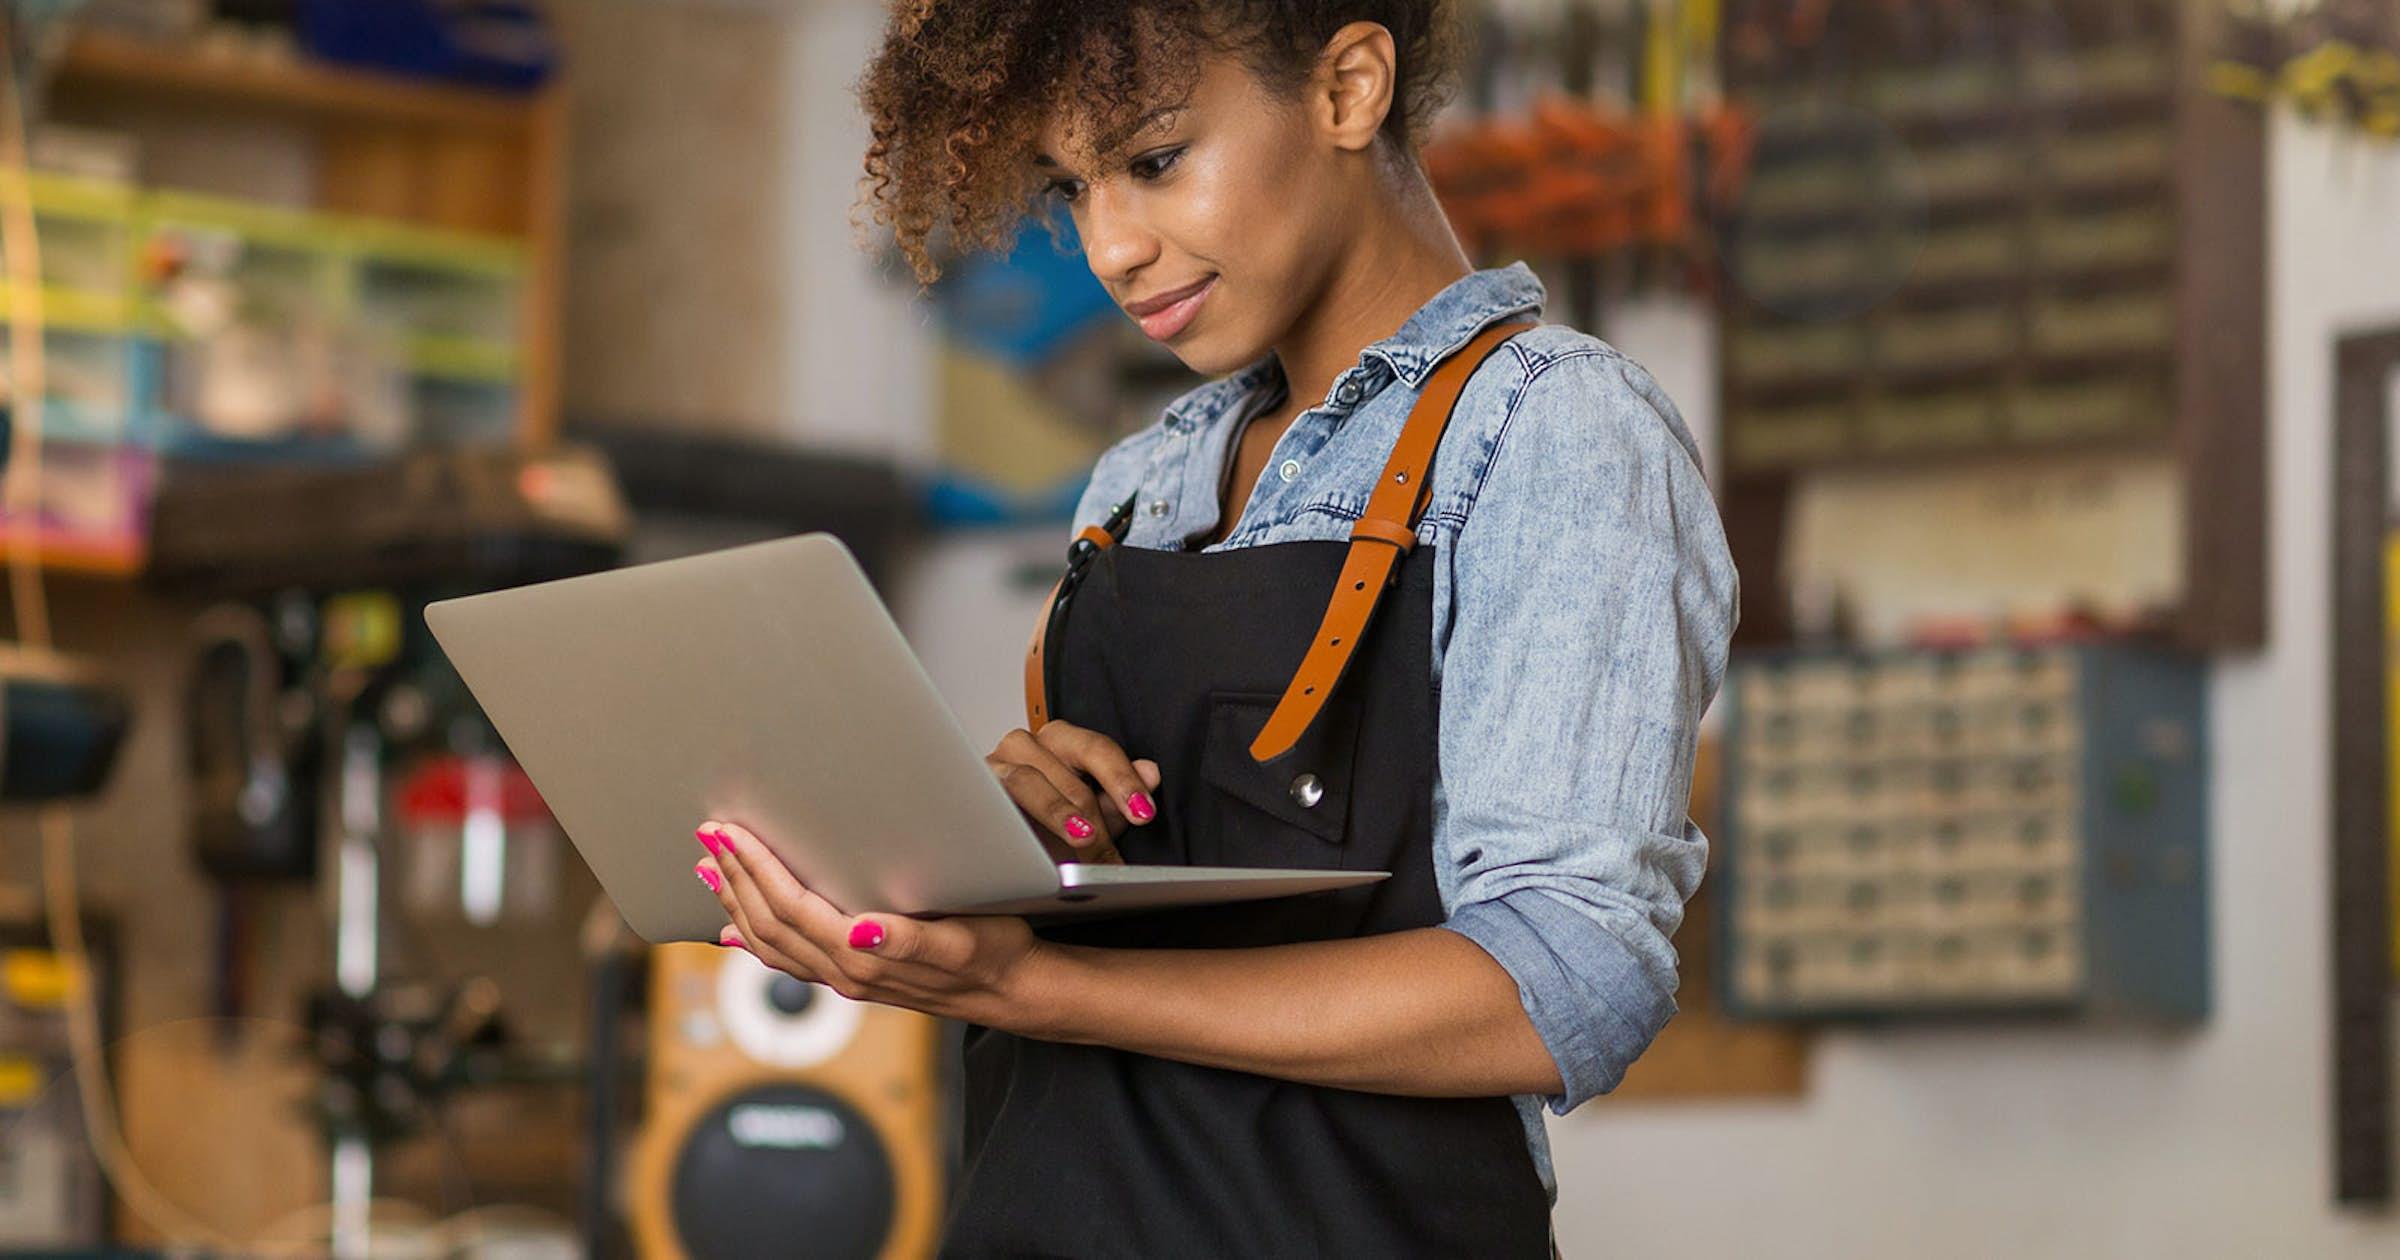 10 Ways Small Businesses Can Improve Their Social Media Presence | DMI